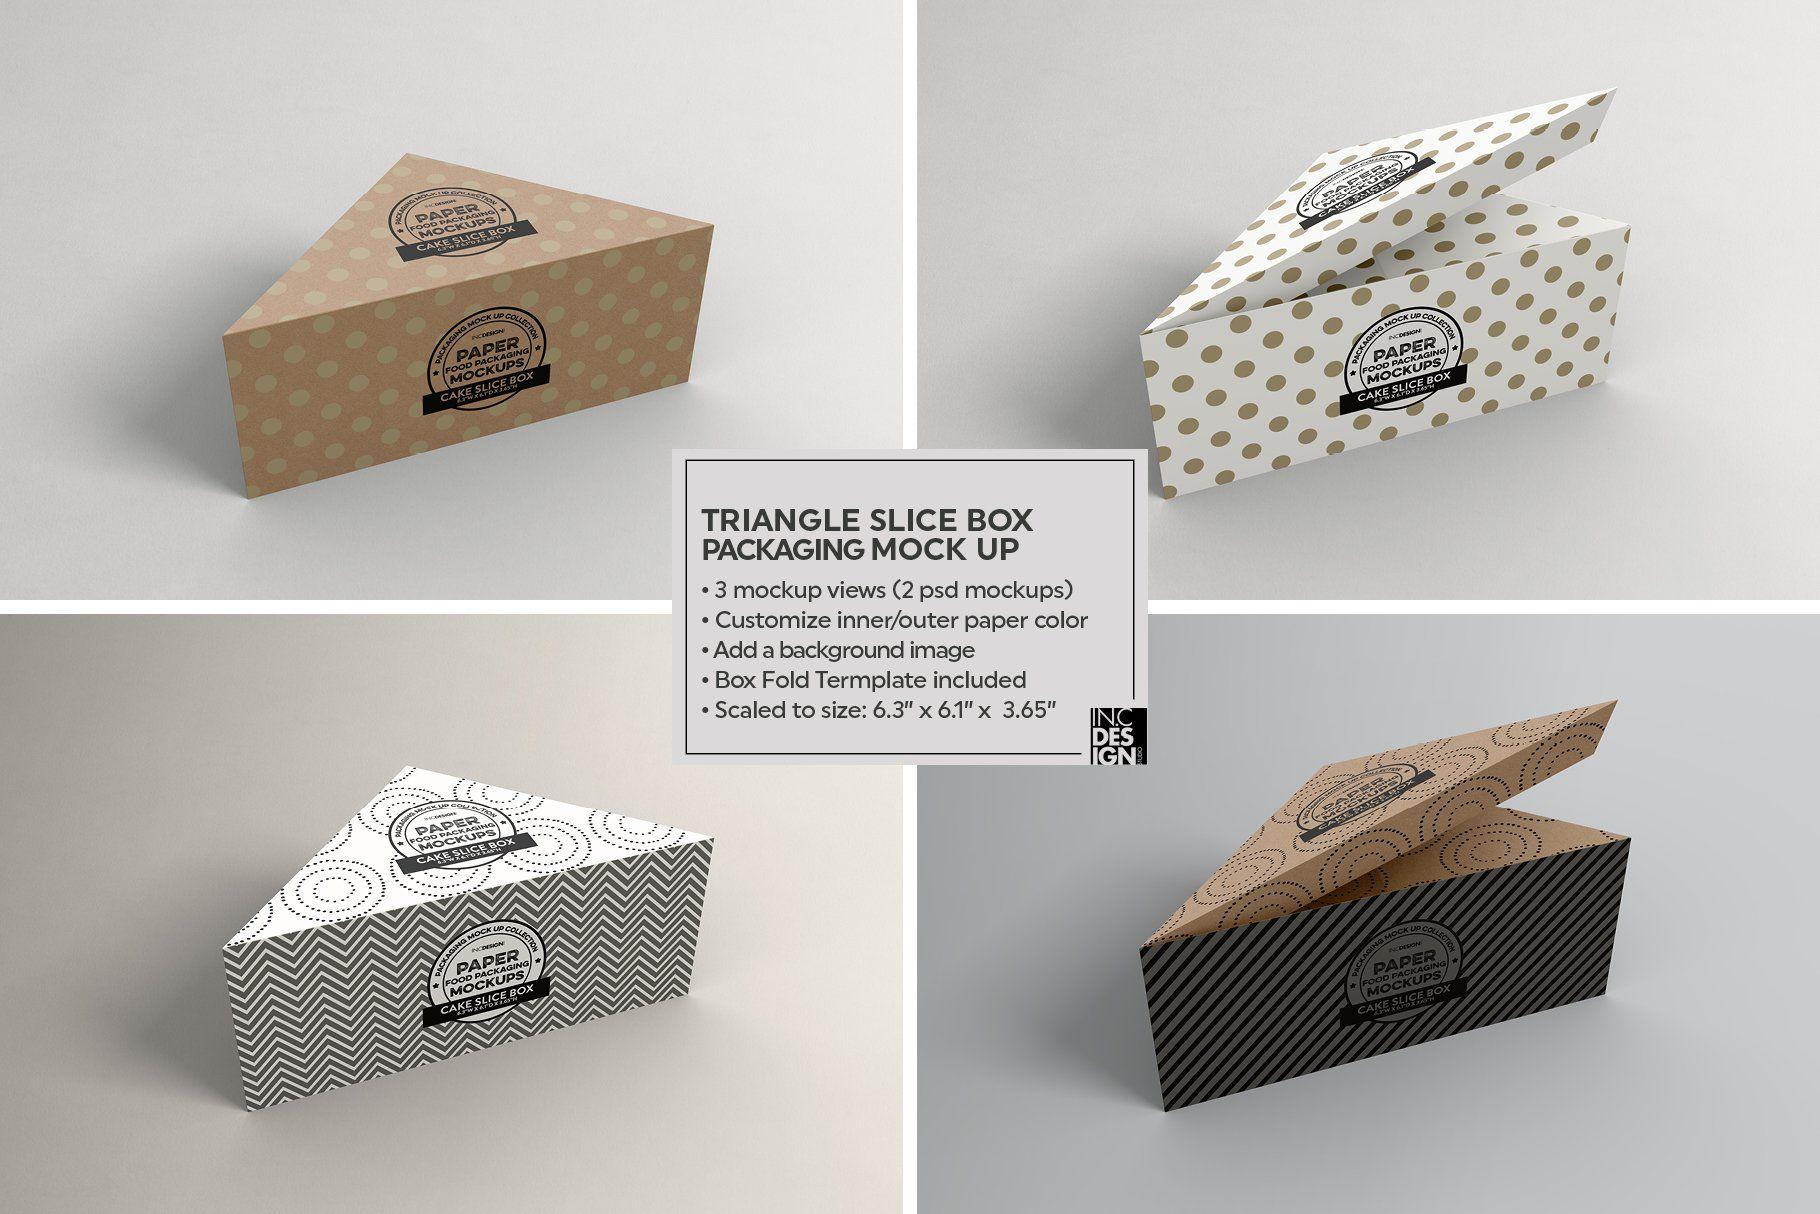 Download Cake Slice Box Packaging Mockup Bottle Design Packaging Cake Slice Boxes Cake Slice Packaging